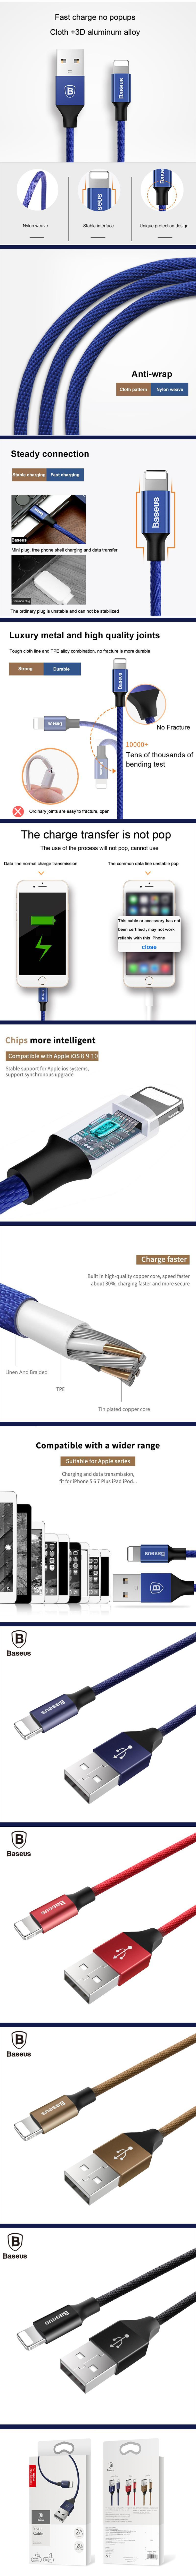 Baseus 2a Fast Charging Ios 10 Lightning To Usb Charger Data Cable Mcdodo 18m Auto Disconnect Merah Aeproductgetsubject Kata Kunci Juga Dicari Belanja Murah Iphone